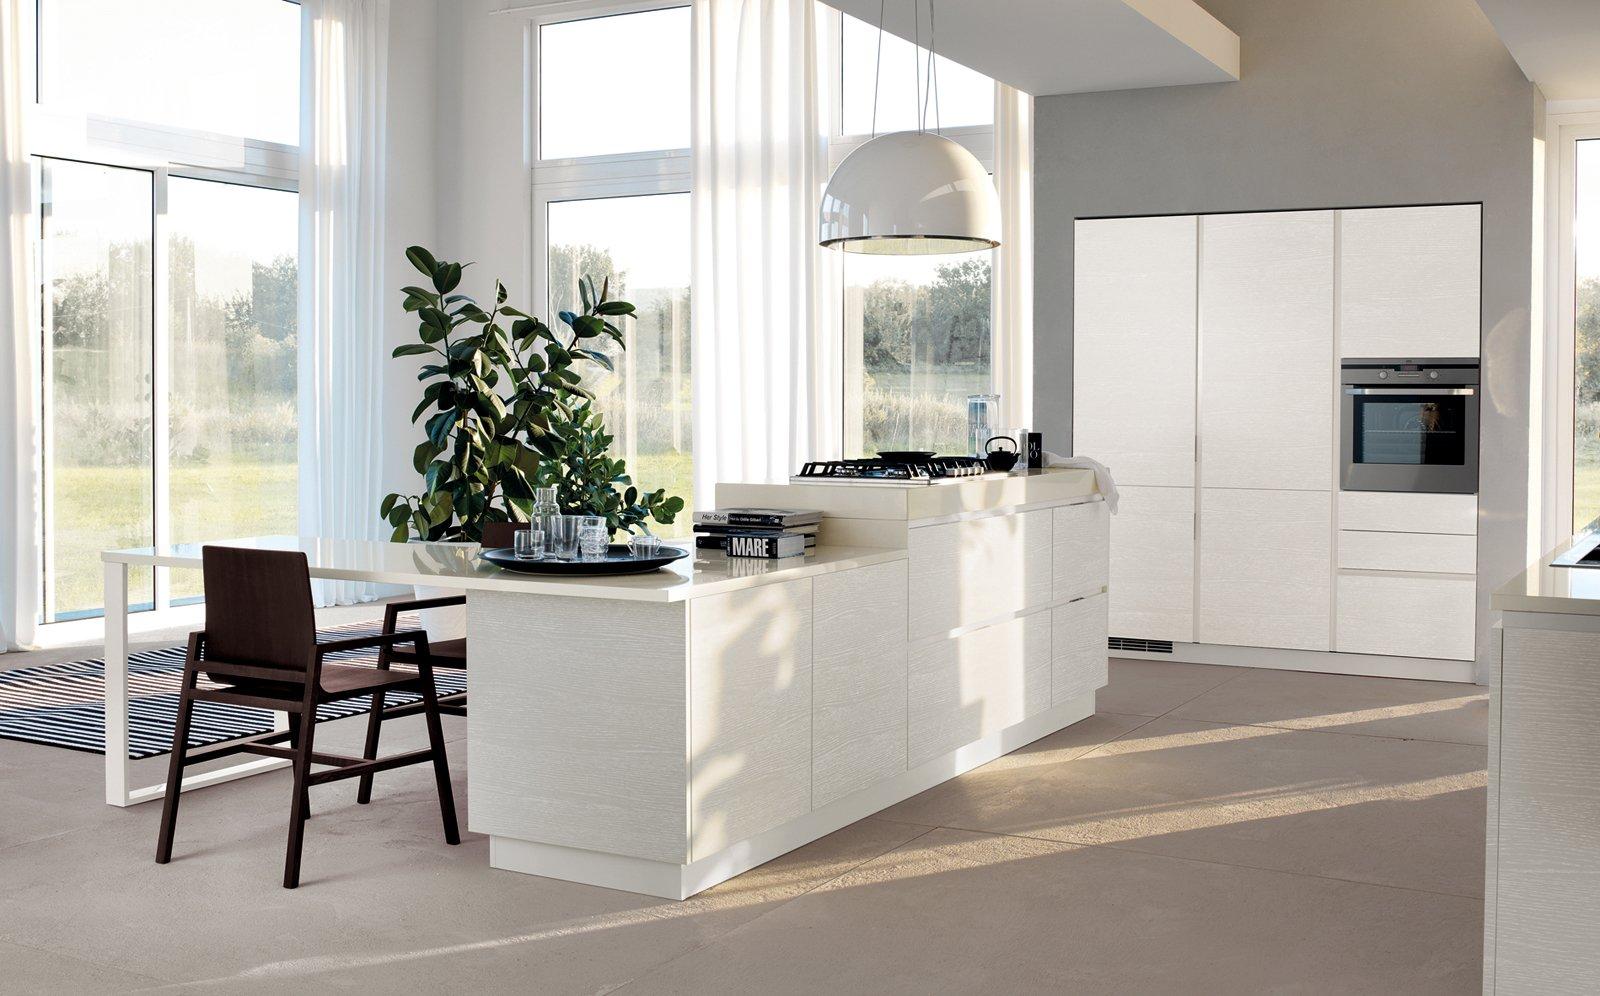 Open Space Che Inglobano Cucina Sala Da Pranzo E Living. L'isola  #4A5B3E 1600 996 Cucine Veneta Con Isola